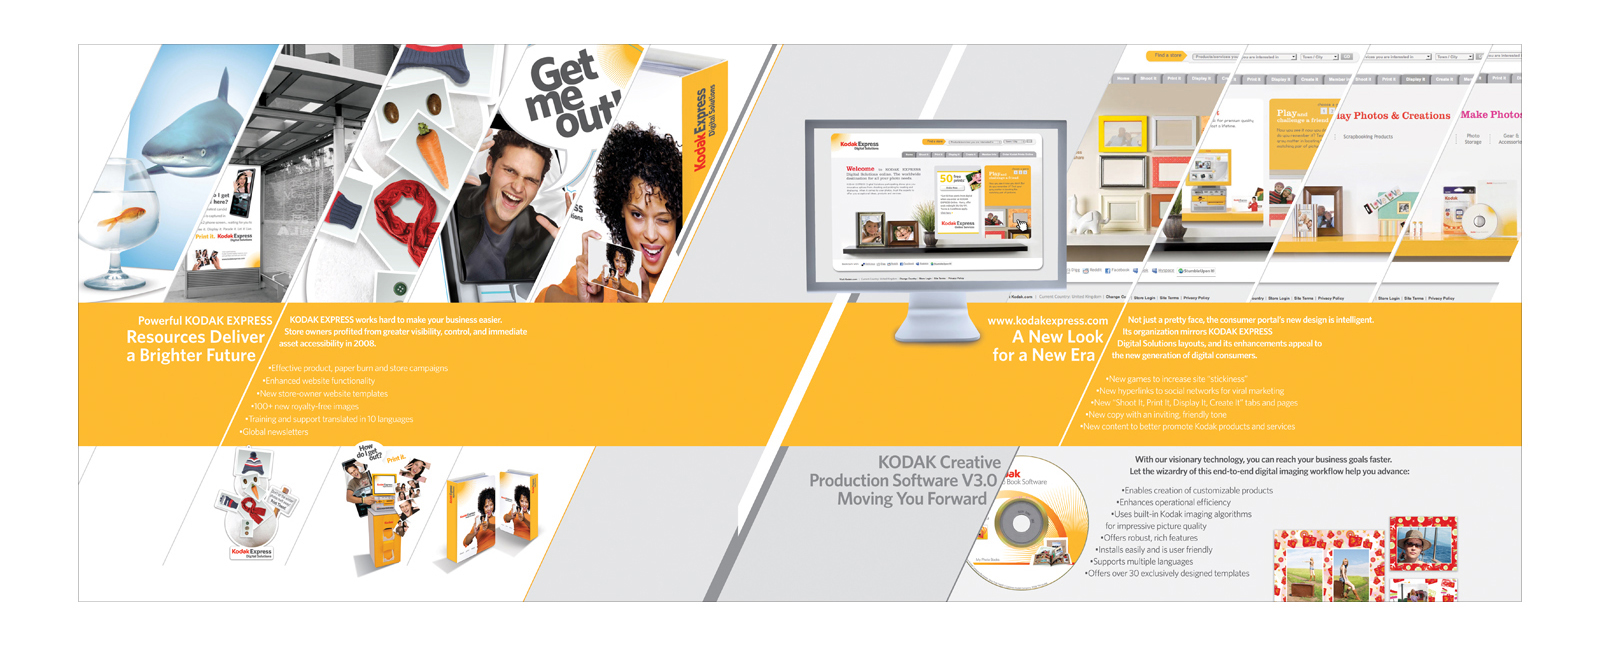 Kodak Express - B2B Brochure on Behance